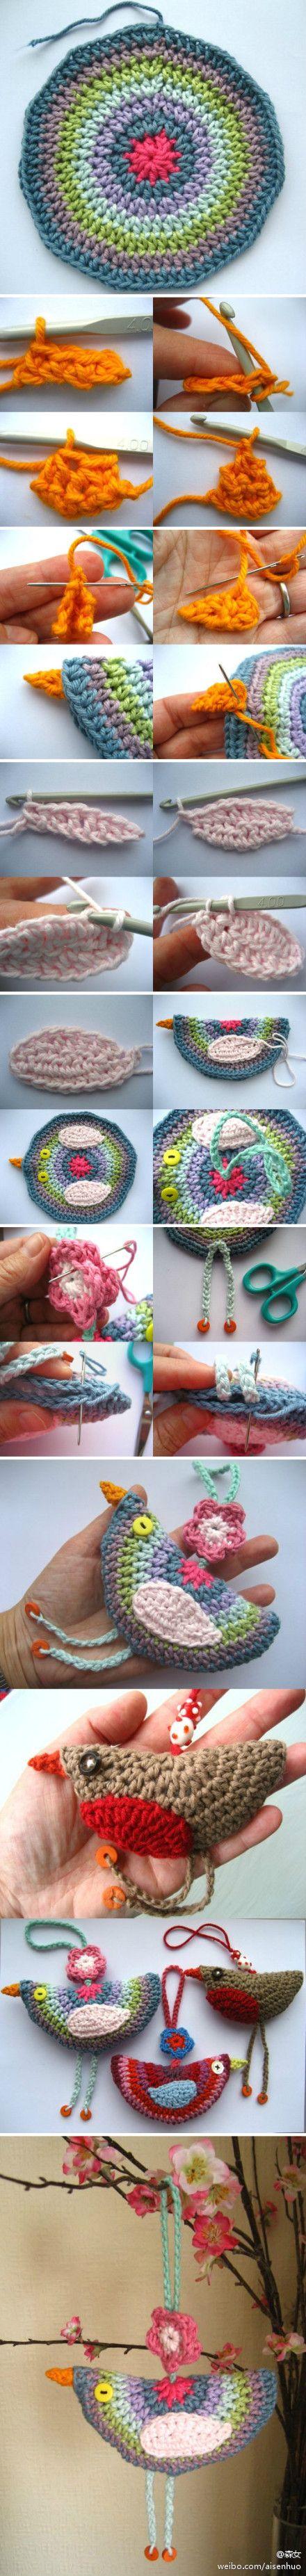 Amigurumi Bird Tutorial : Crochet birds, Birds photos and Photo tutorial on Pinterest